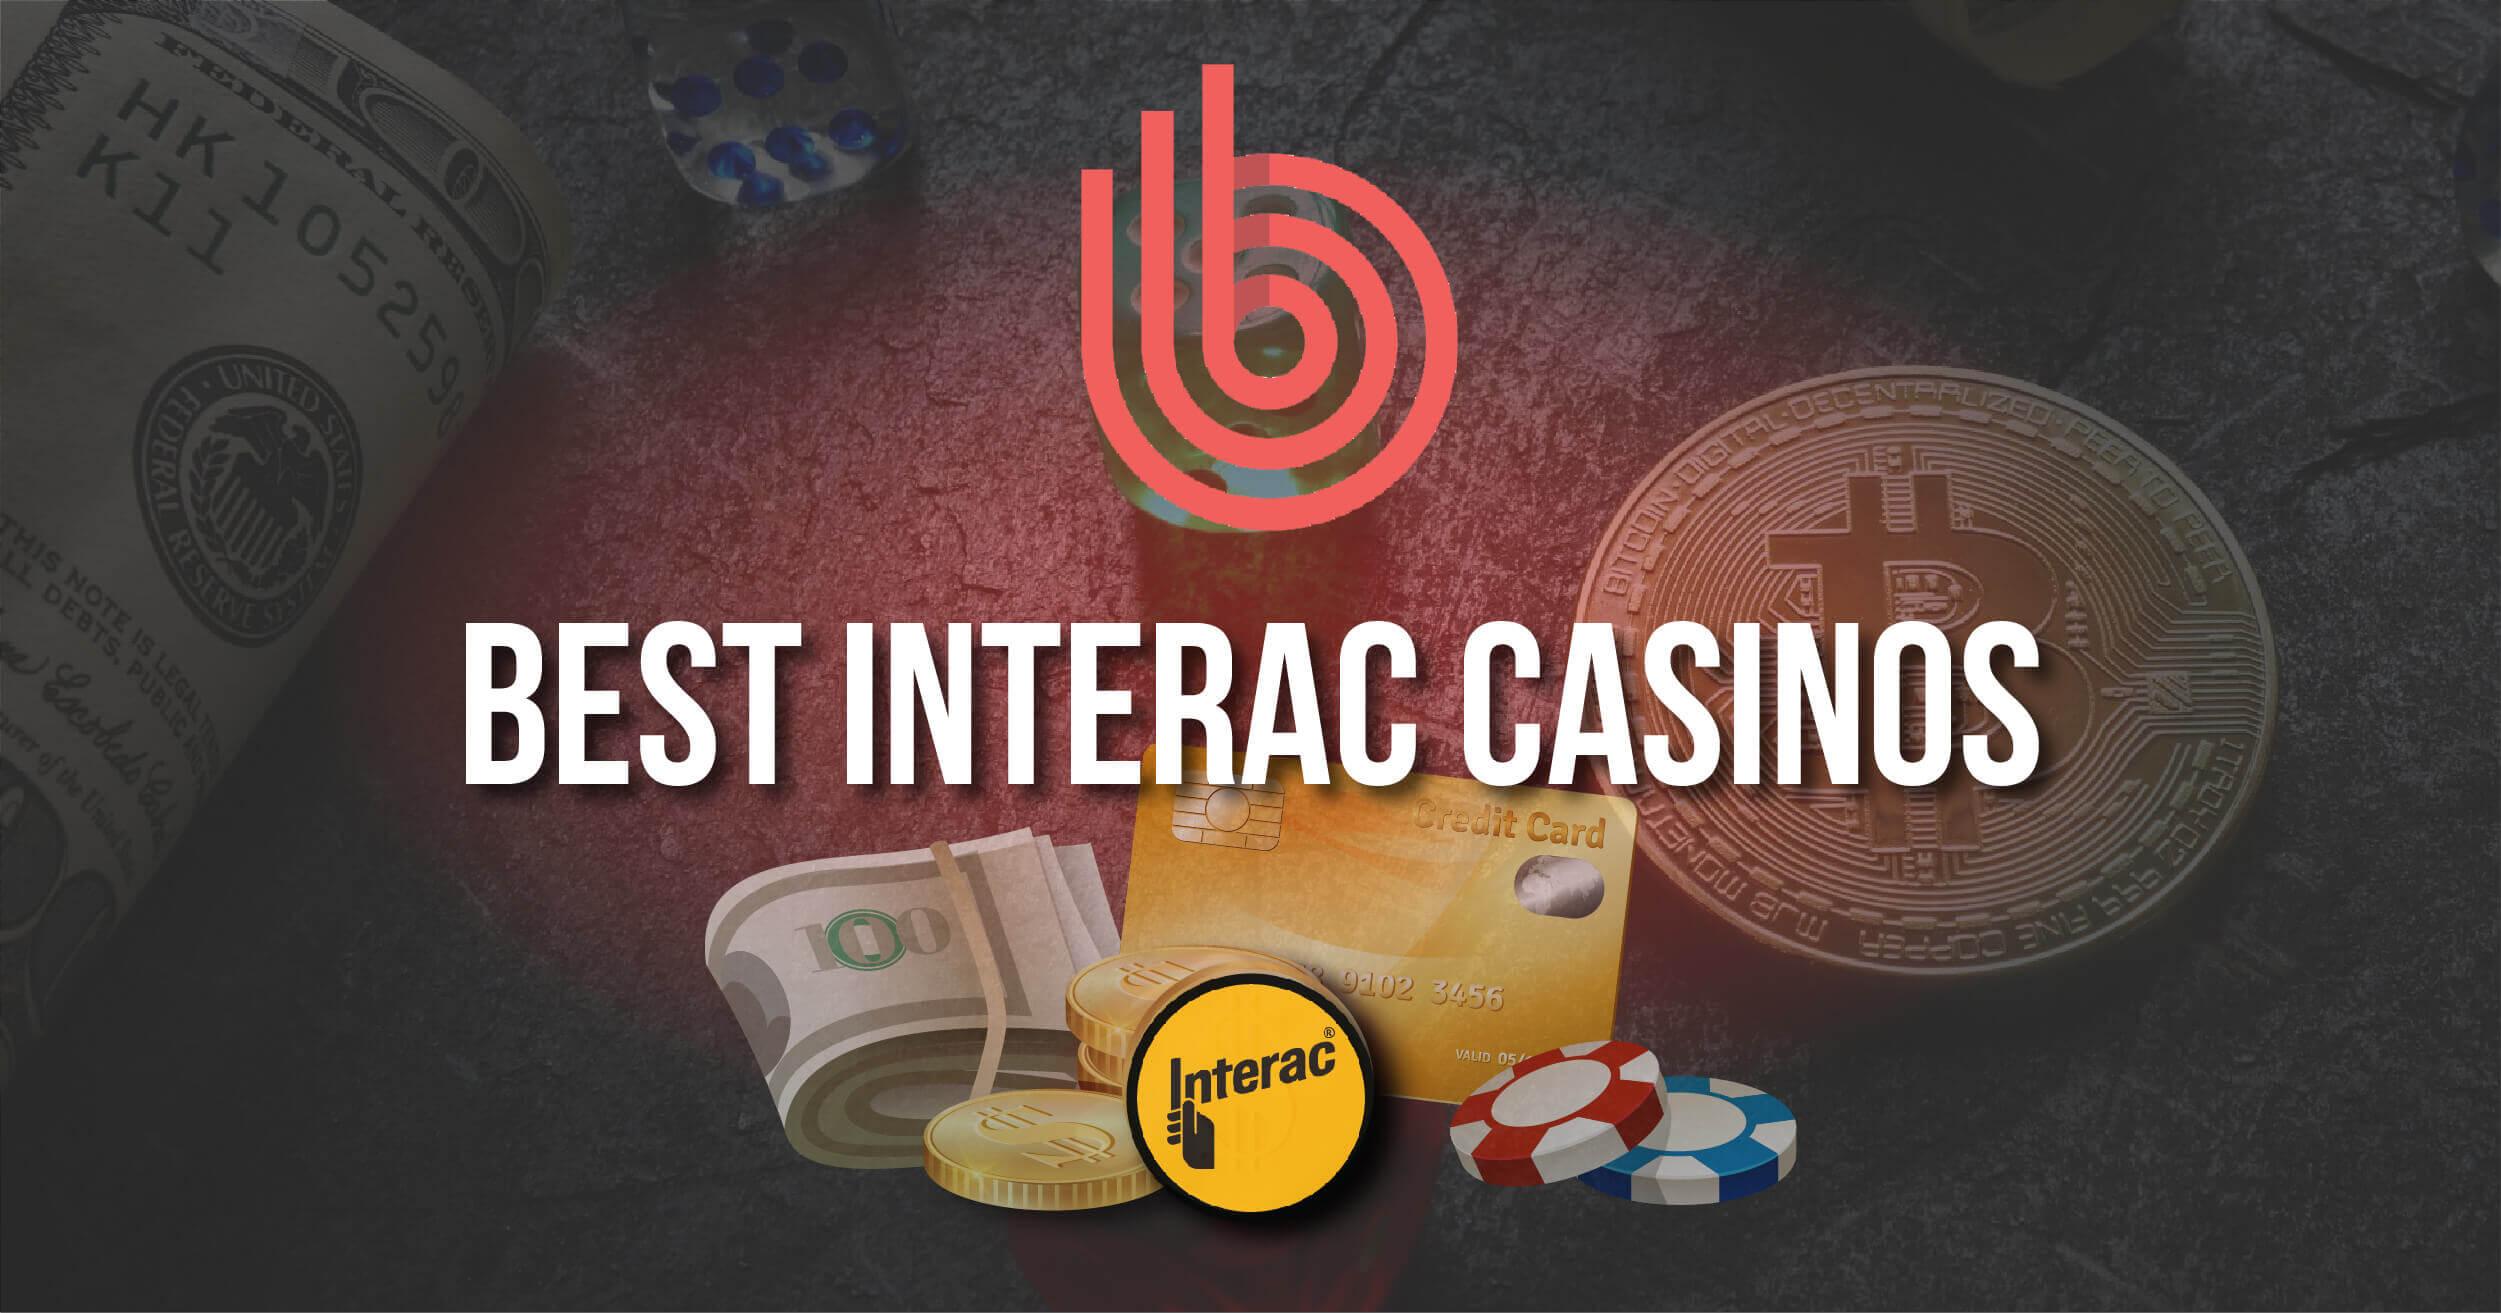 Best Interac Casinos